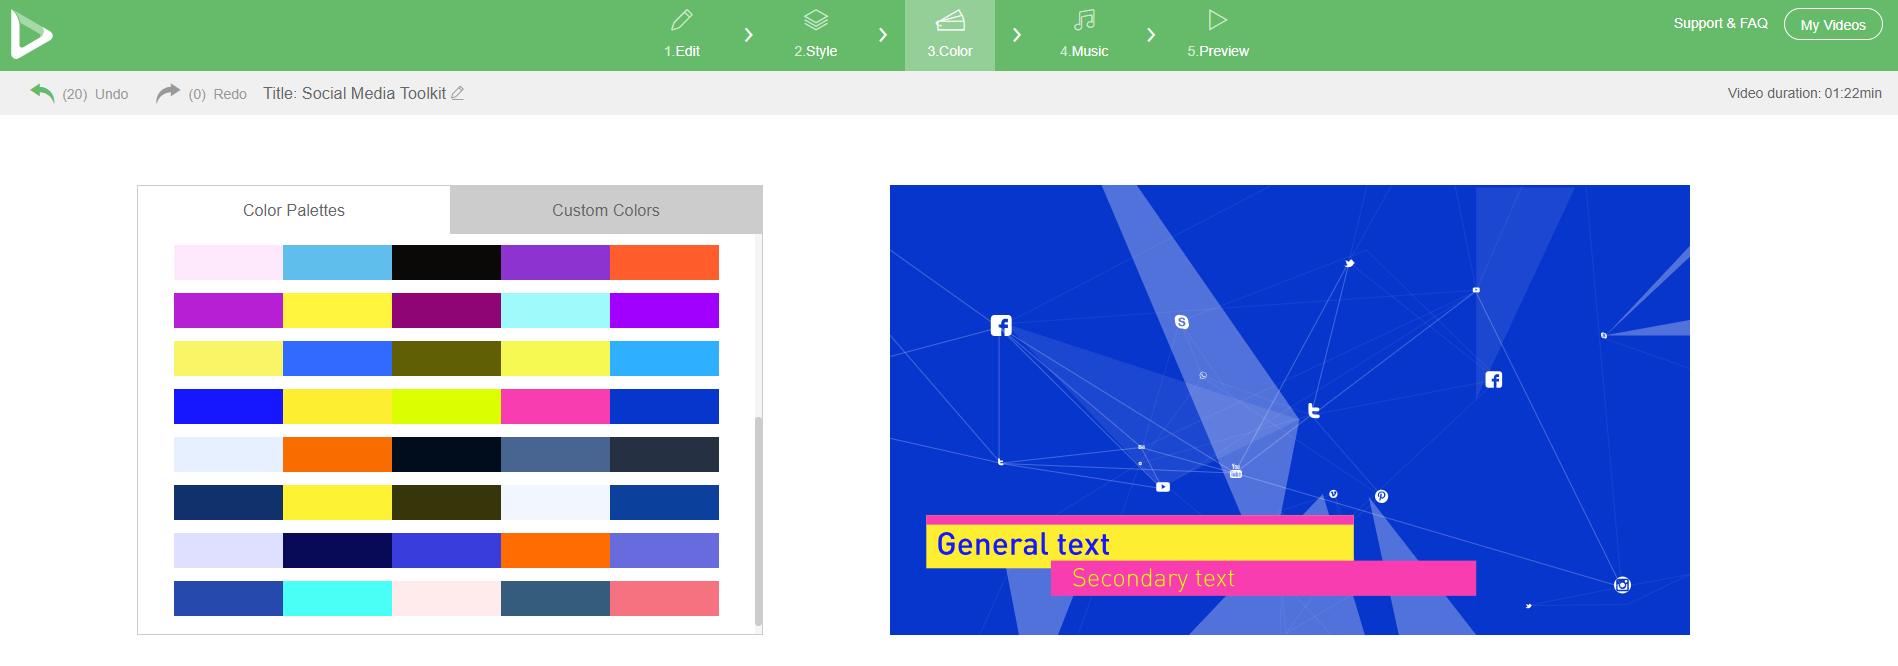 Social Media Toolkit - Colors